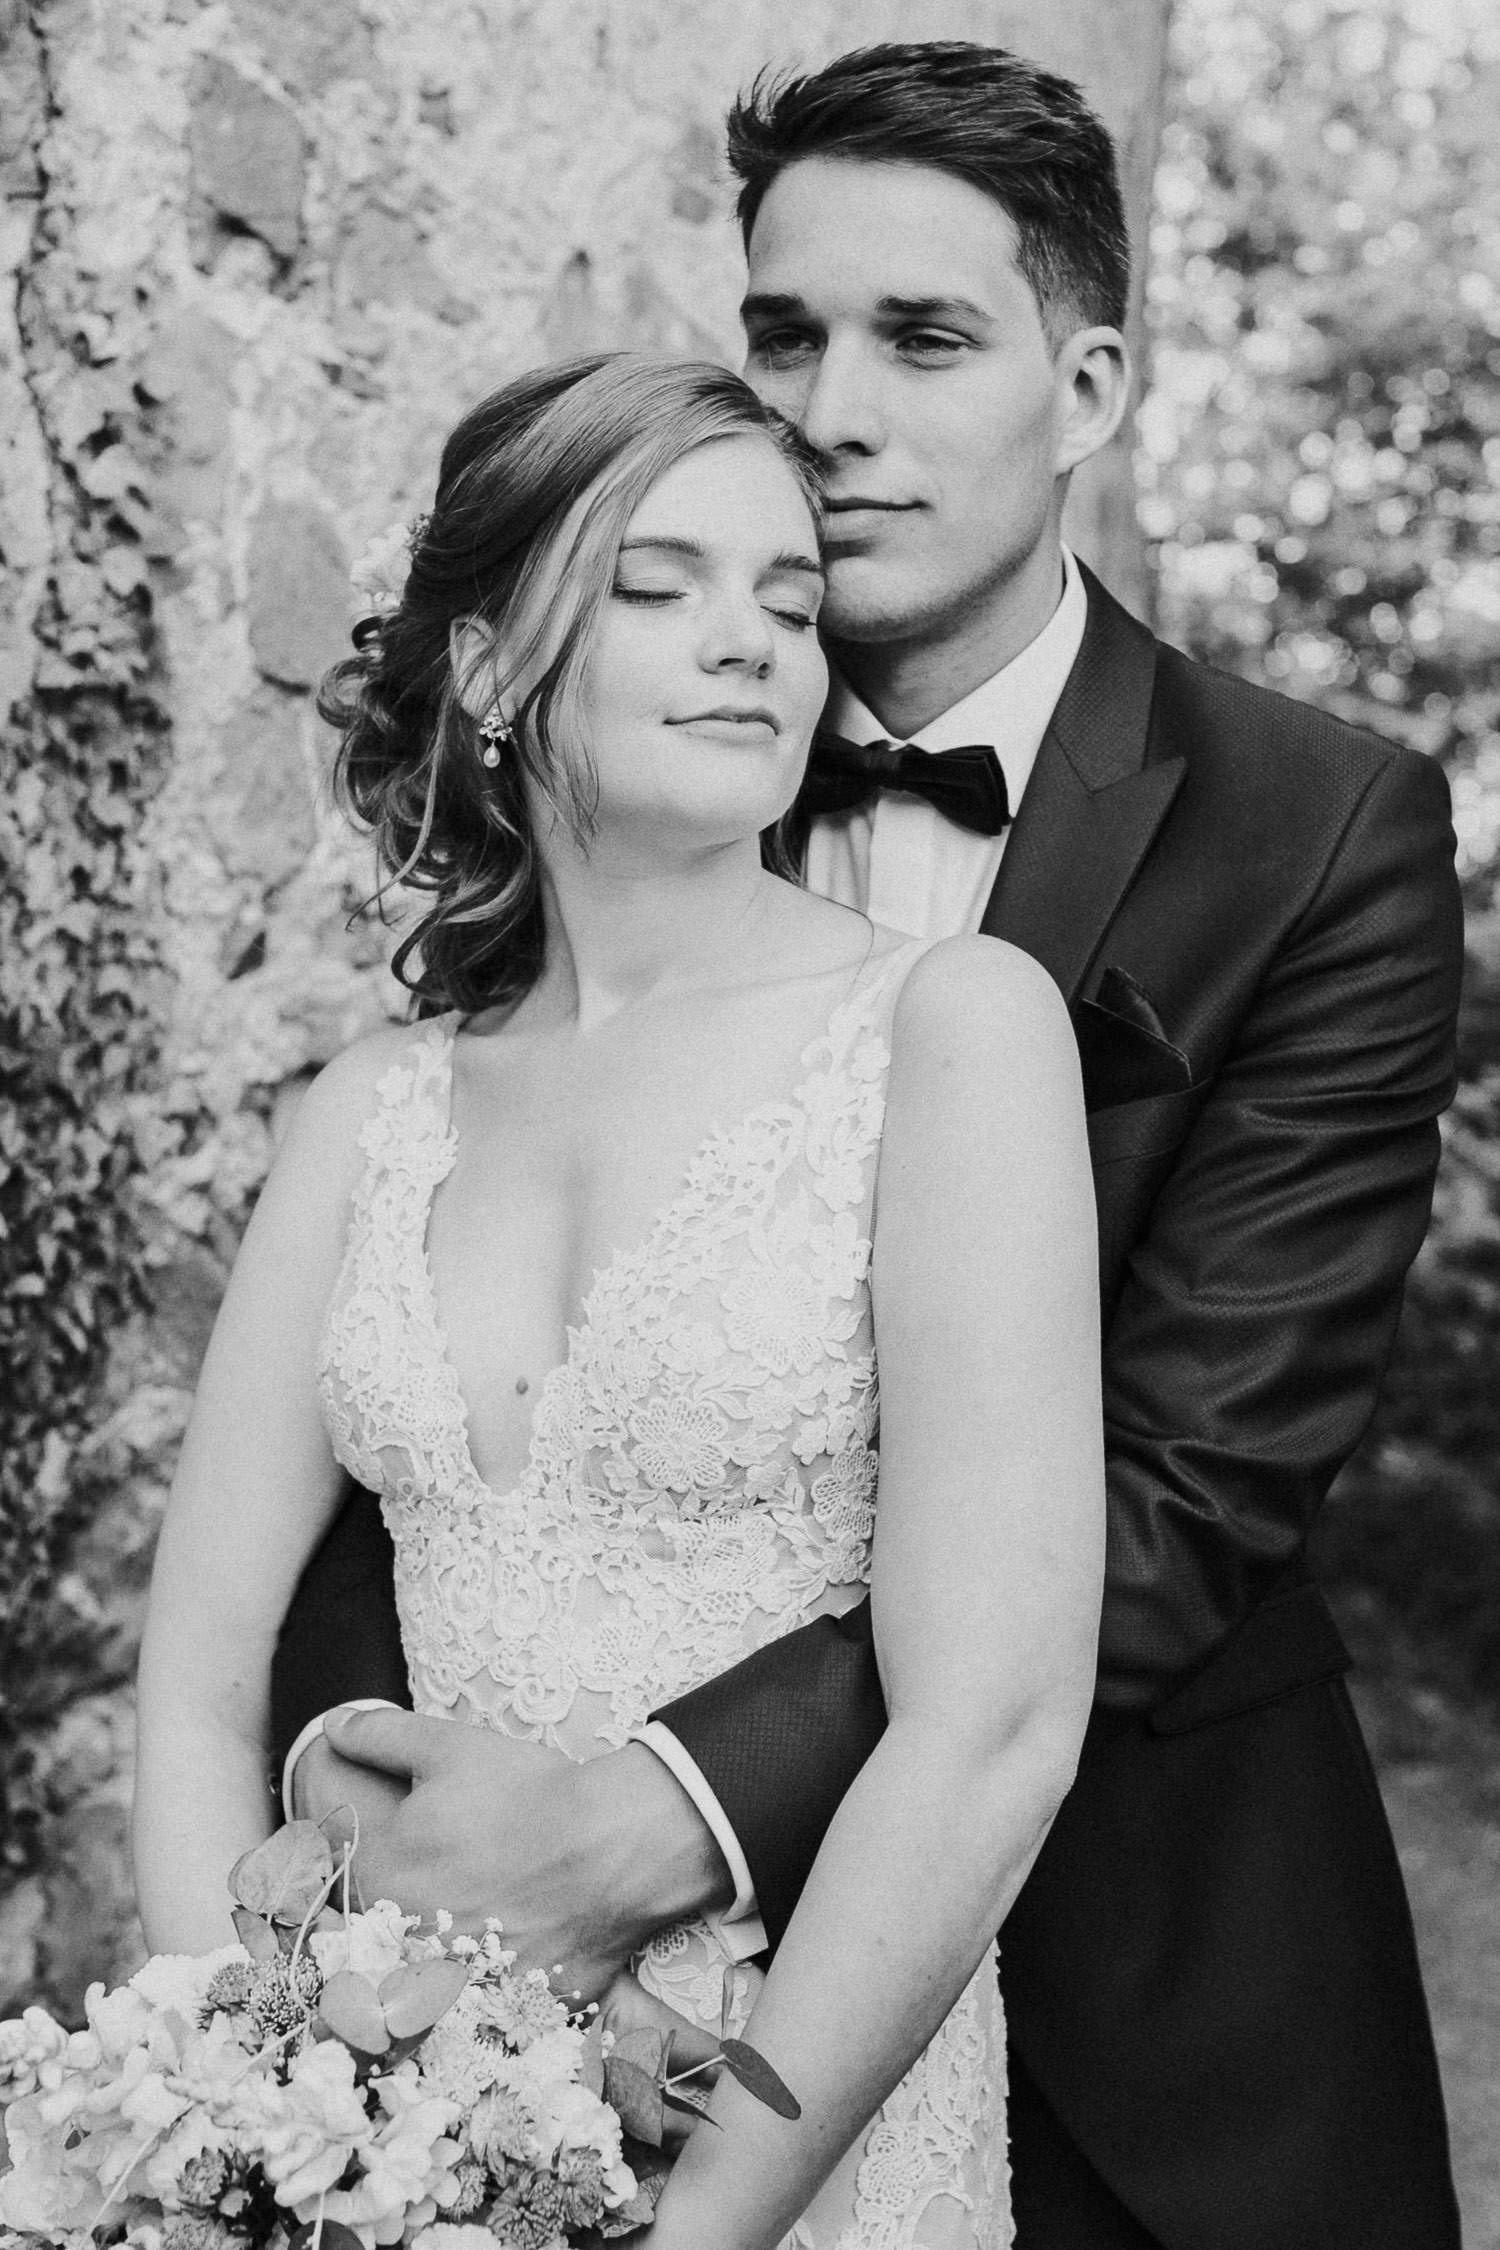 Braut lehnt sich an Bräutigam